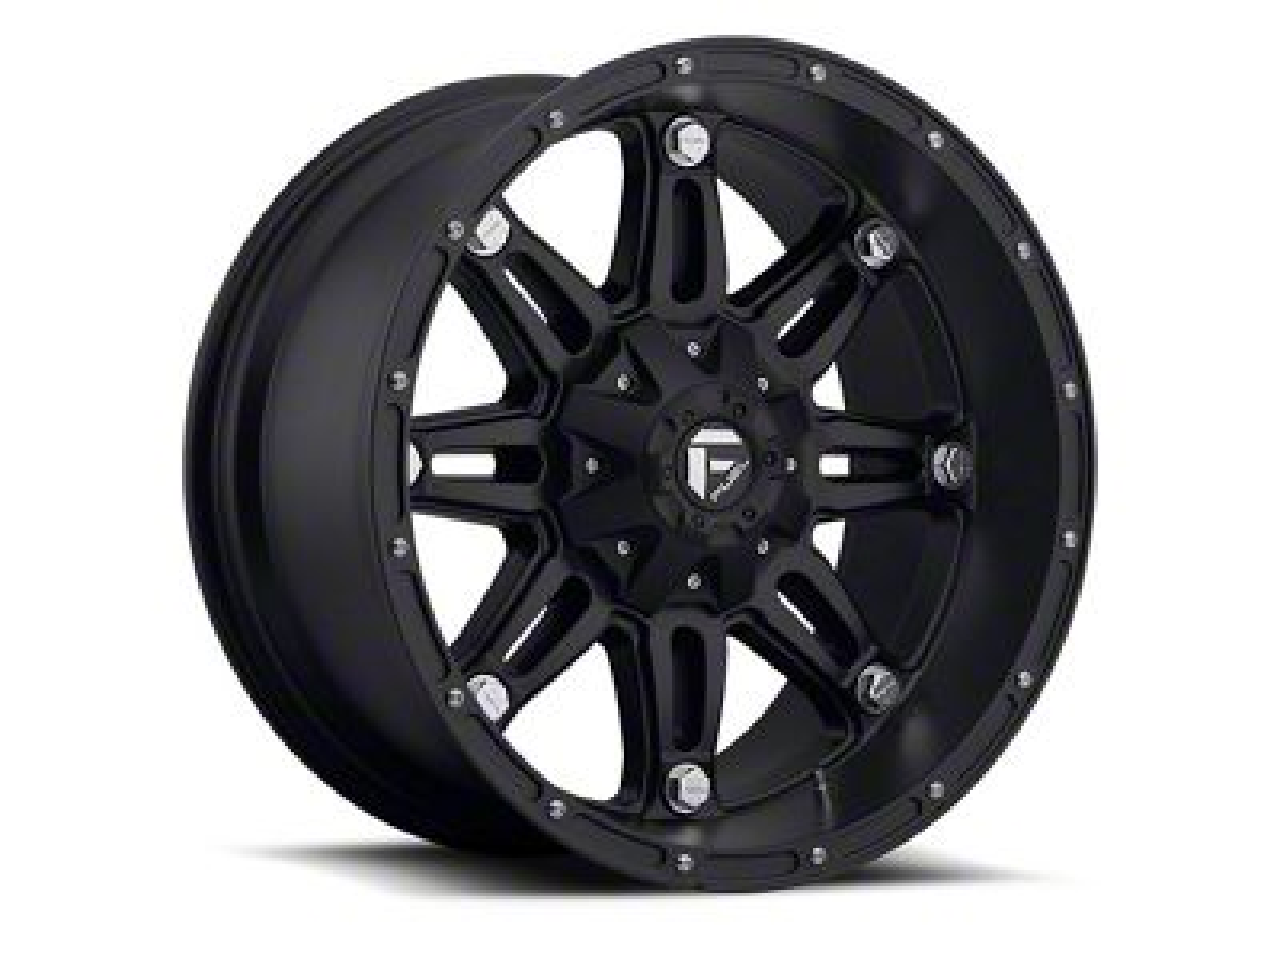 Fuel Wheels Hostage Matte Black 6-Lug Wheel - 20x14 (99-18 Silverado 1500)